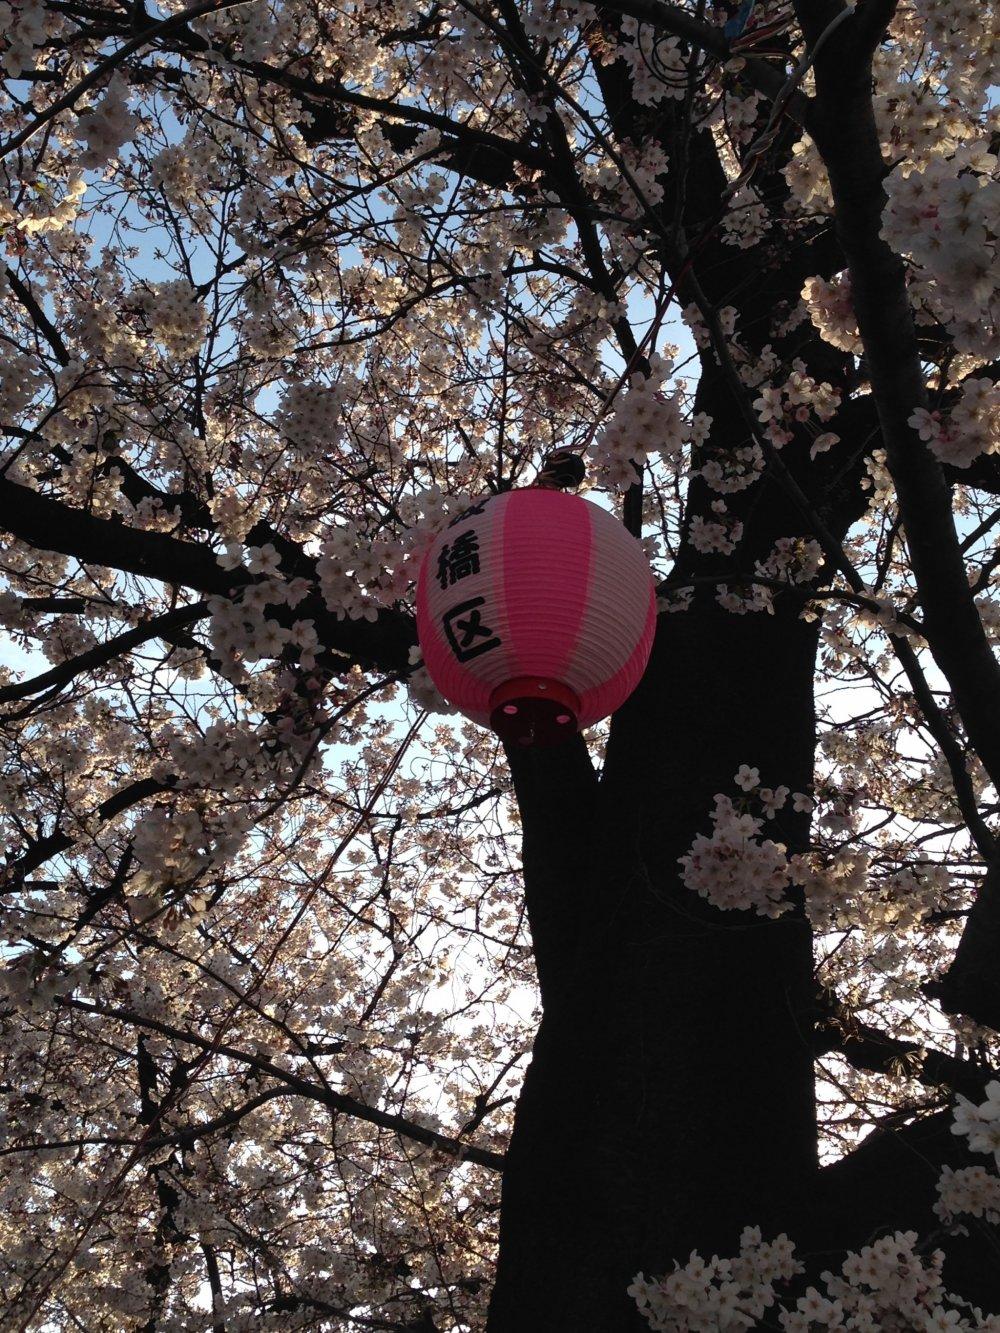 Itabashi-kulantern. The sakura are beautiful at night as well!